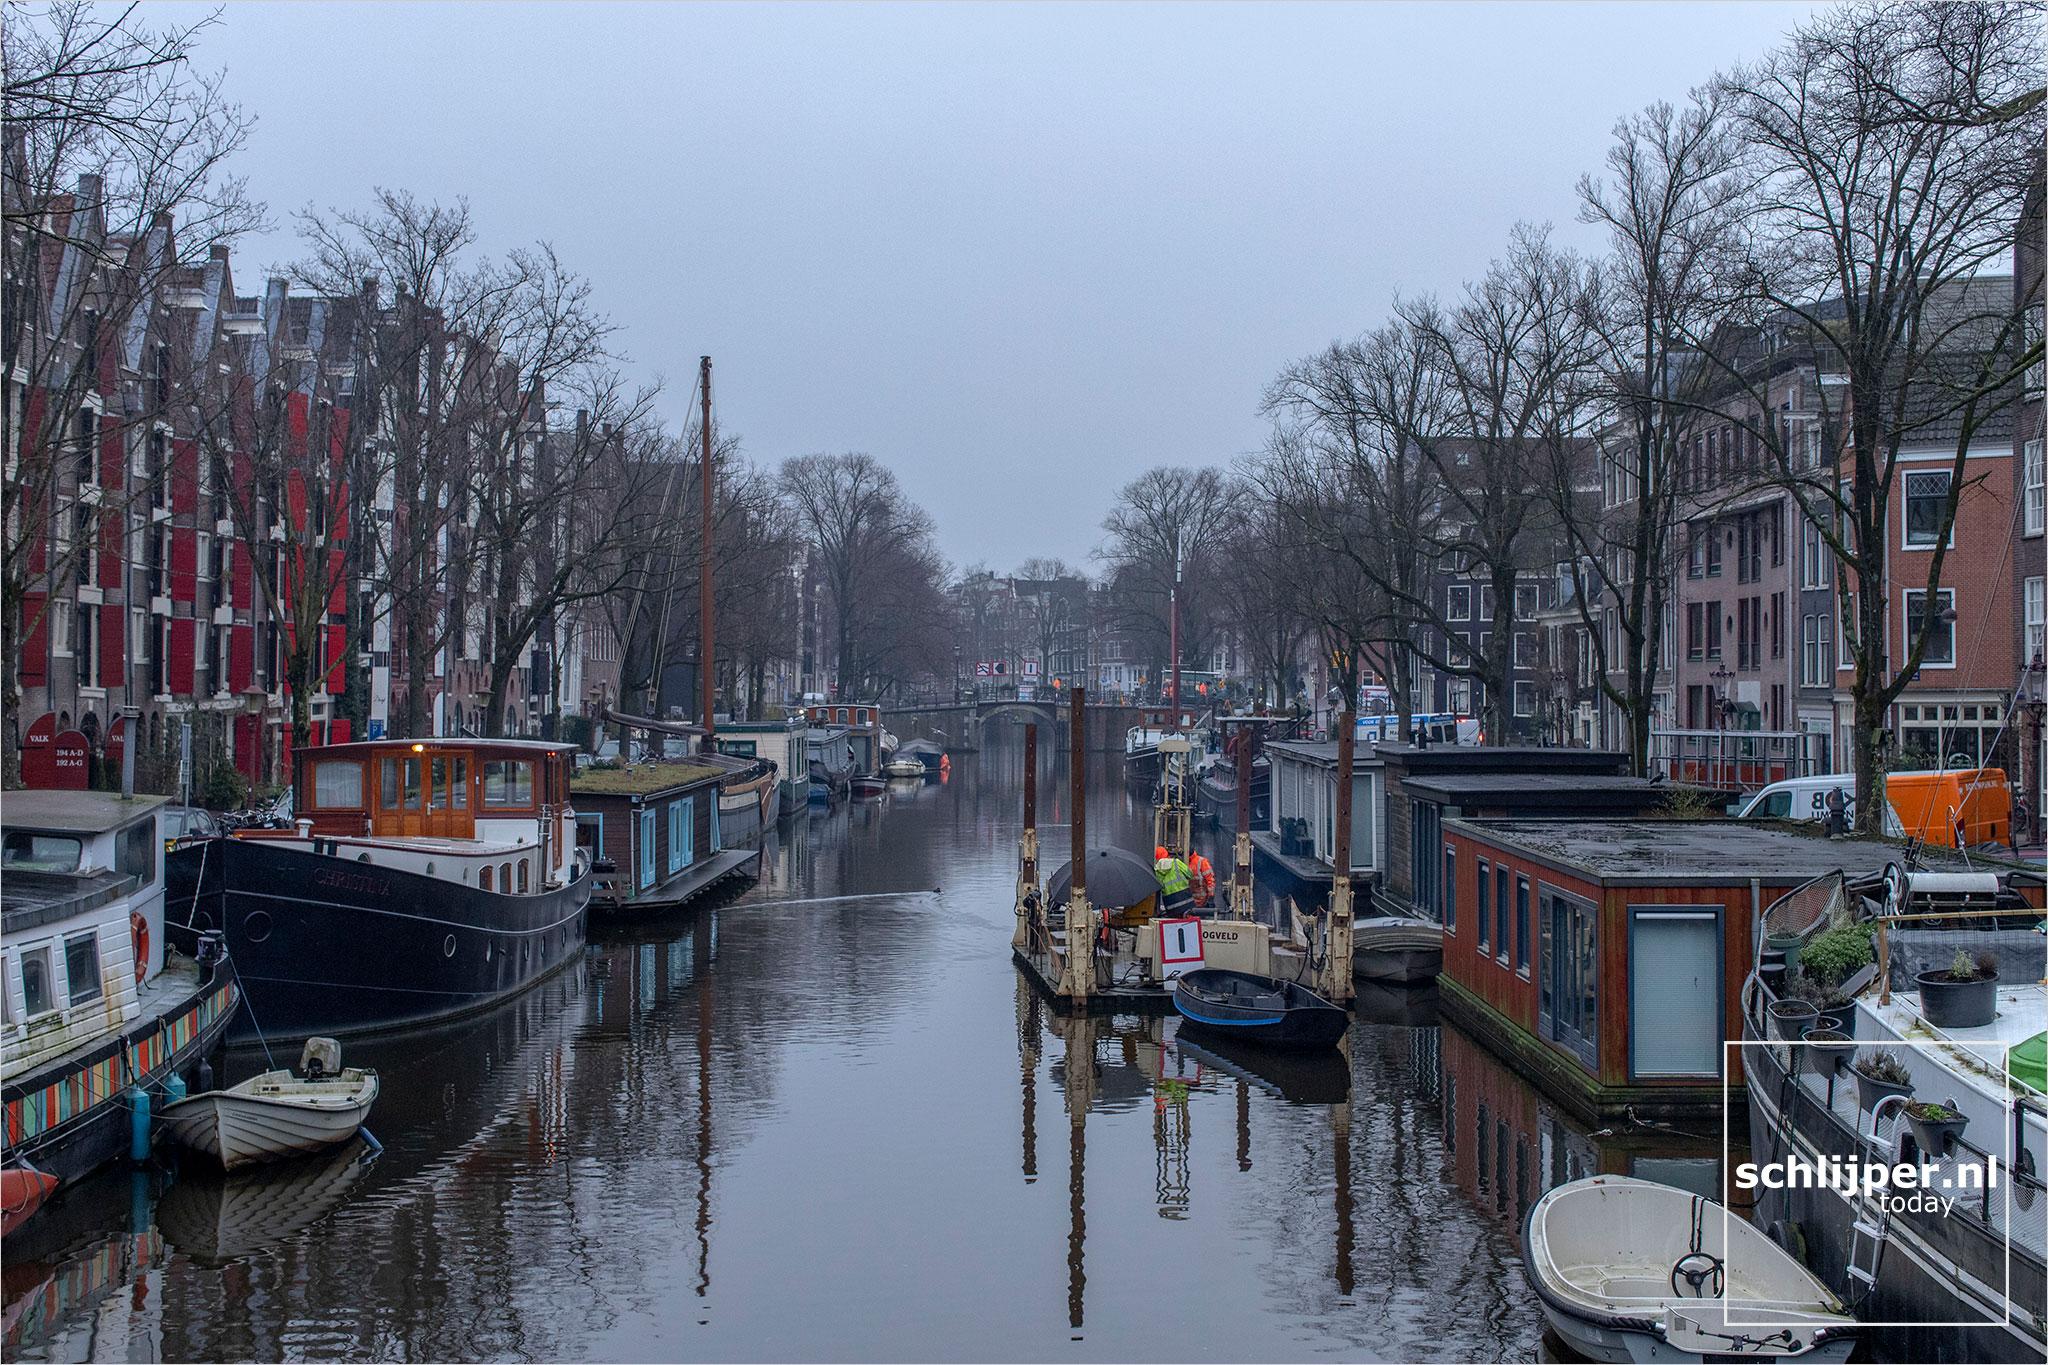 The Netherlands, Amsterdam, 2 februari 2021